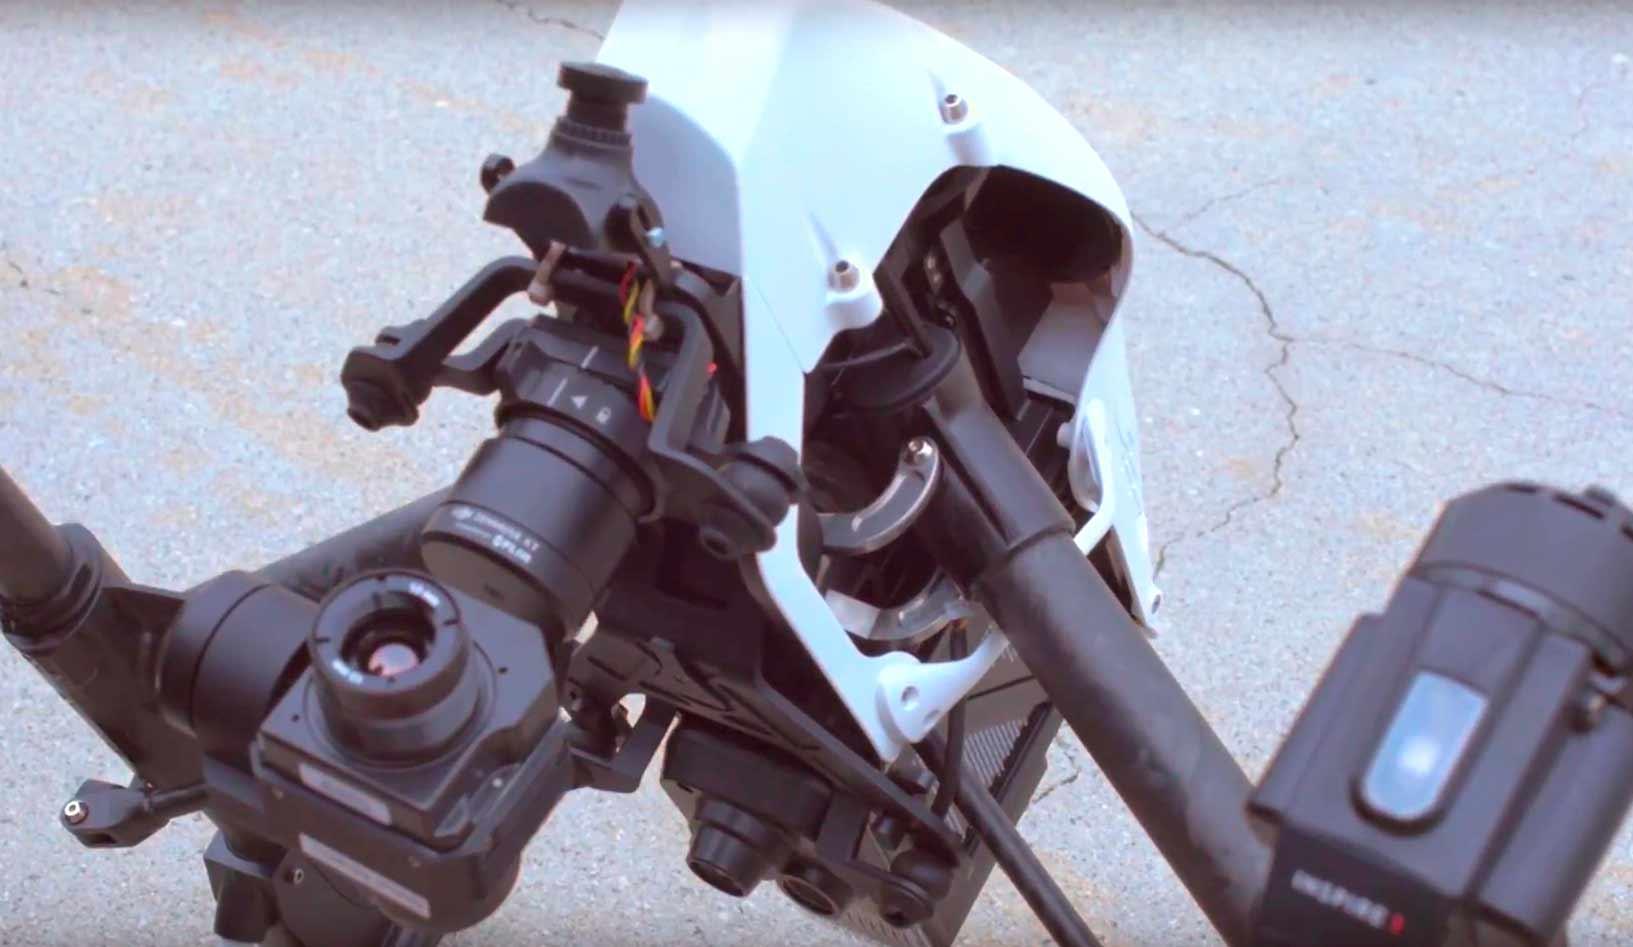 DJI Inspire 2 с колхозной камерой и тепловизором Zenmuse XT